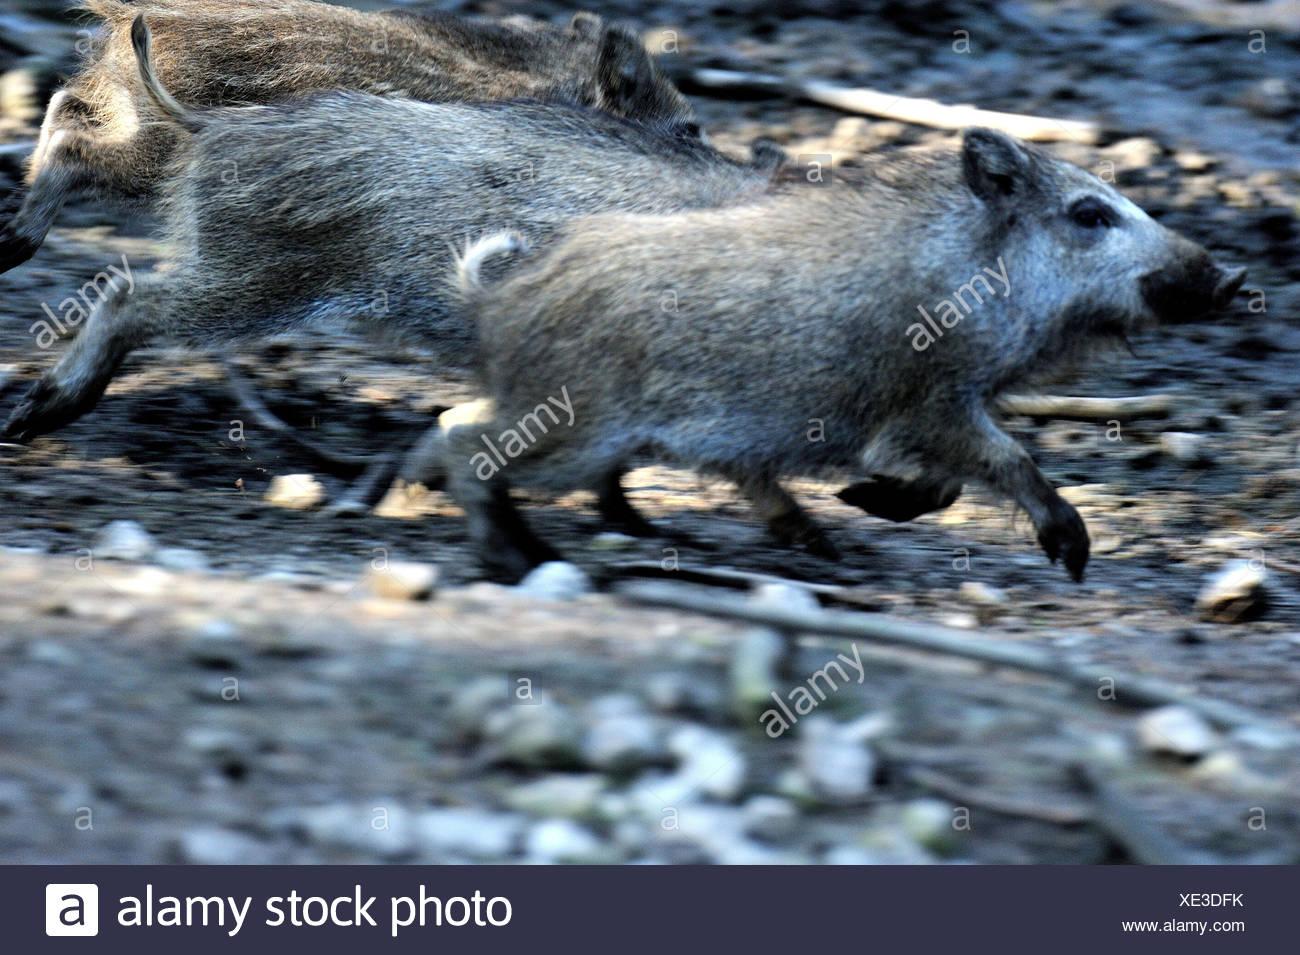 Wild boar, Sus scrofa, making a mess, blur, - Stock Image